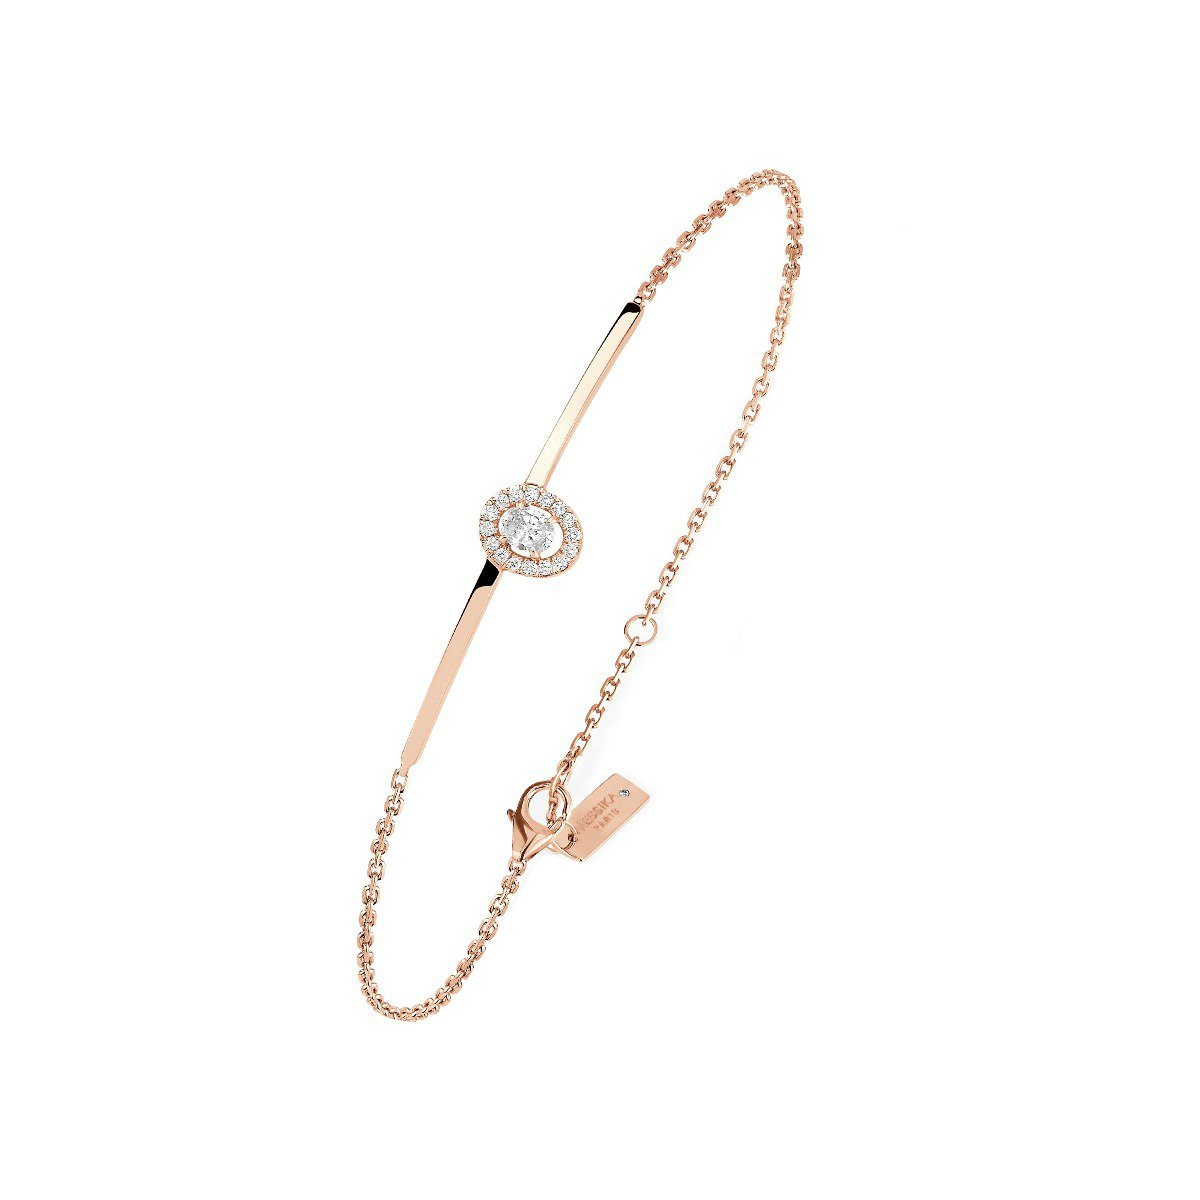 Bracelet Messika Glam'Azone en or rose et diamants vue 1